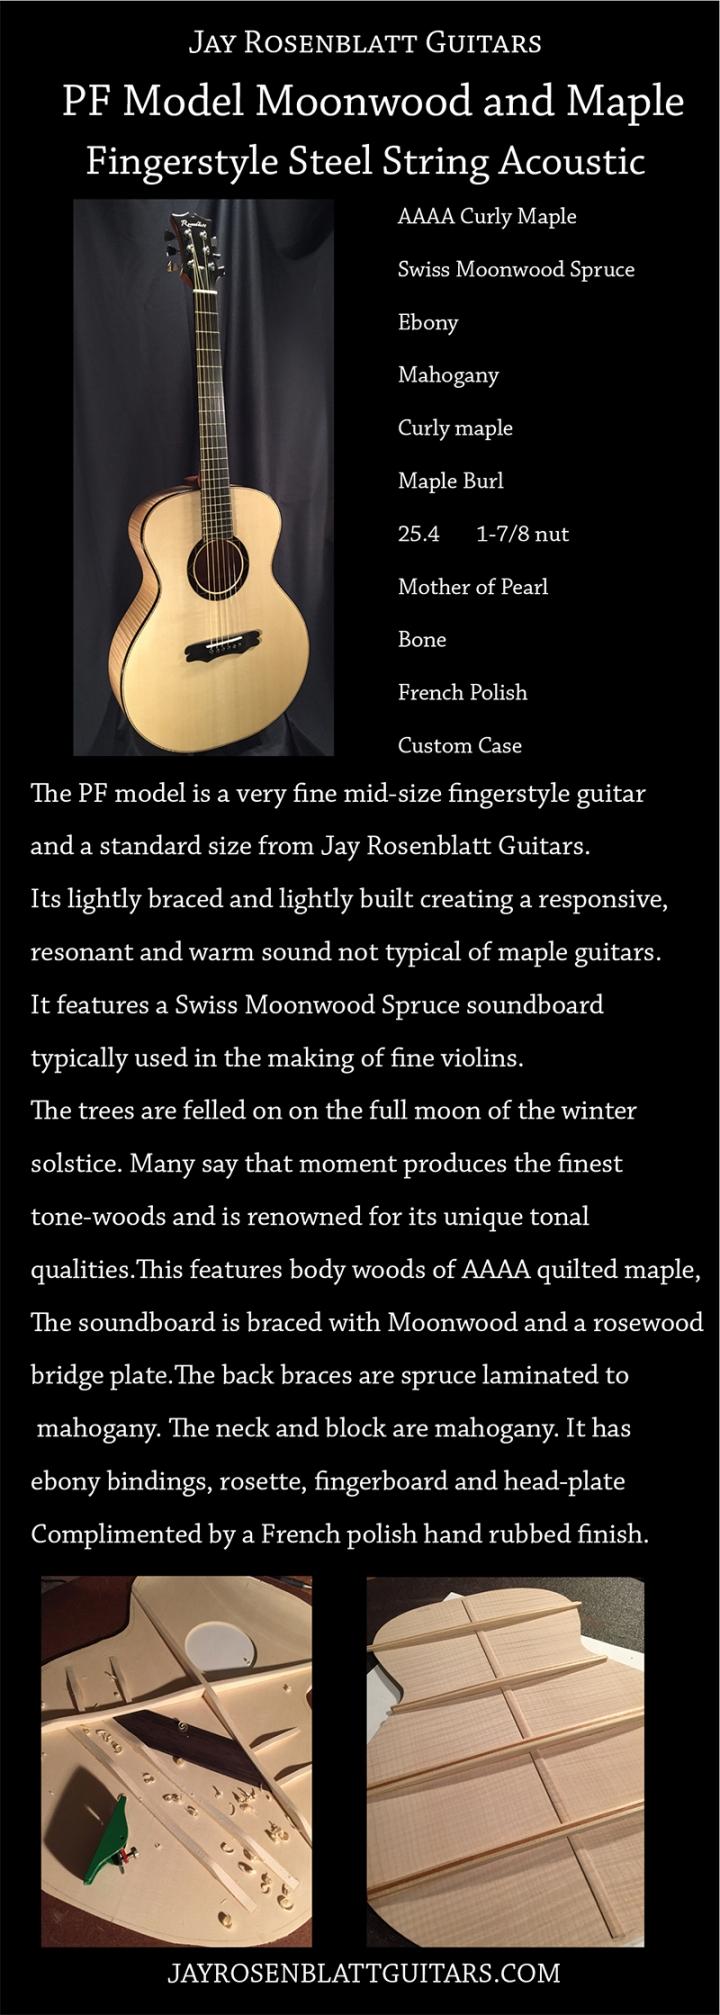 Jay Rosenblatt Guitar PF Model in Moonwood with maple and mahogany.